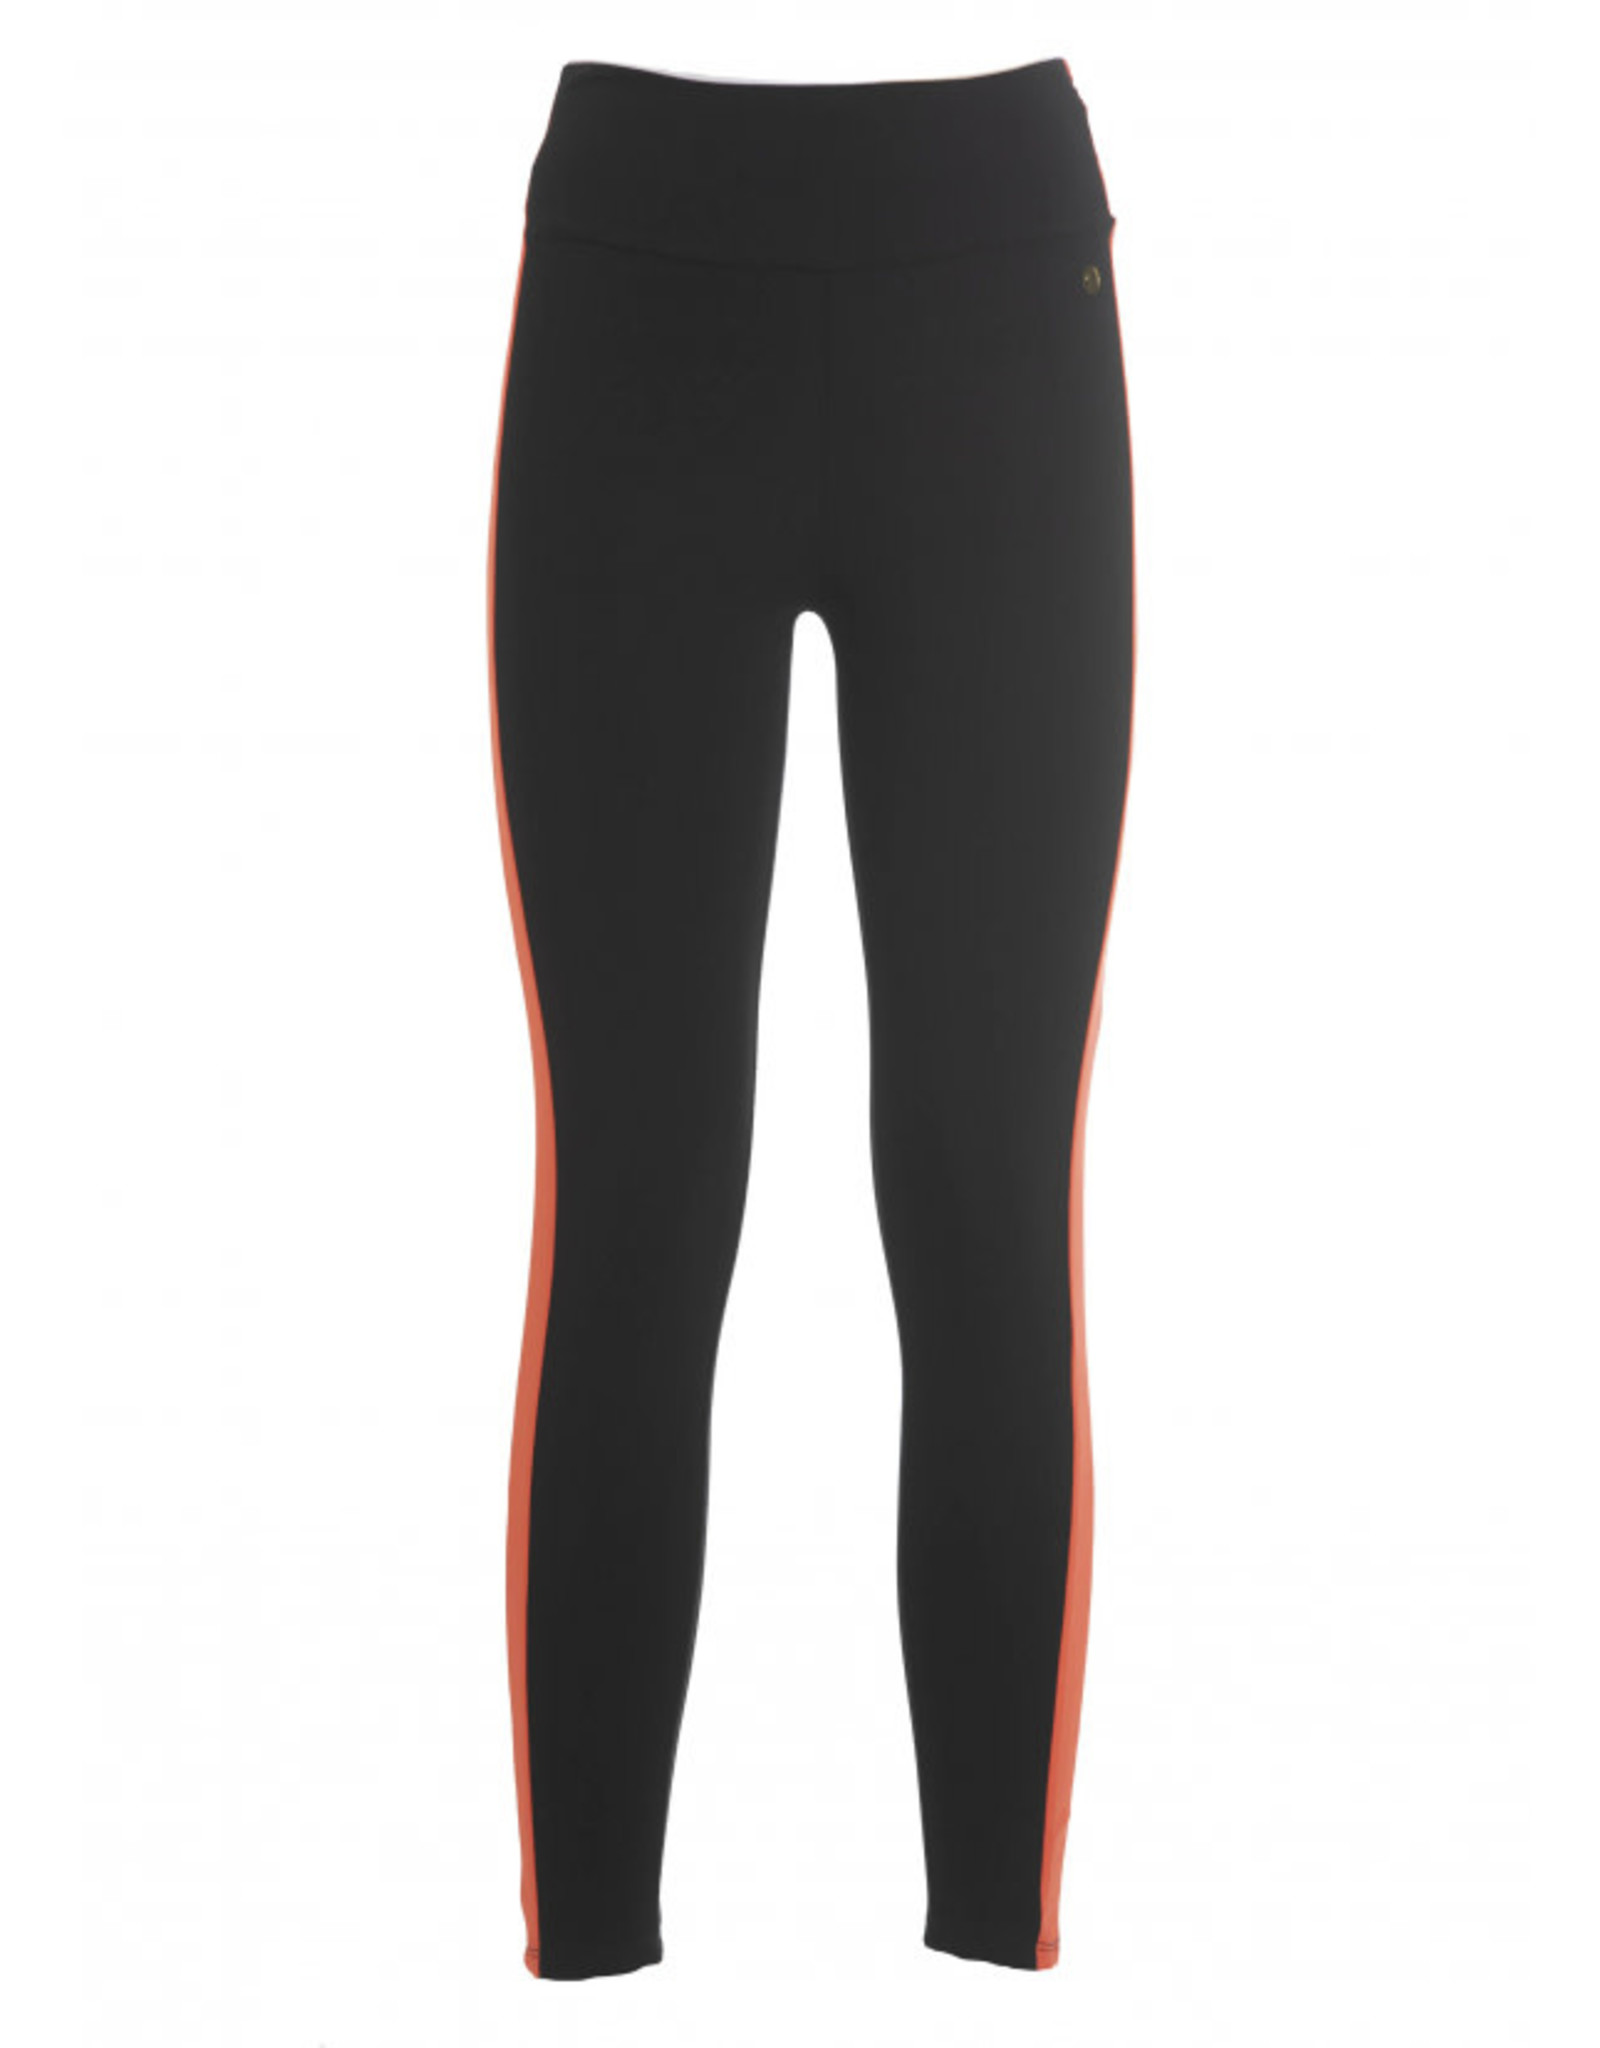 Deha SS21 B44498 Multicolor leggings